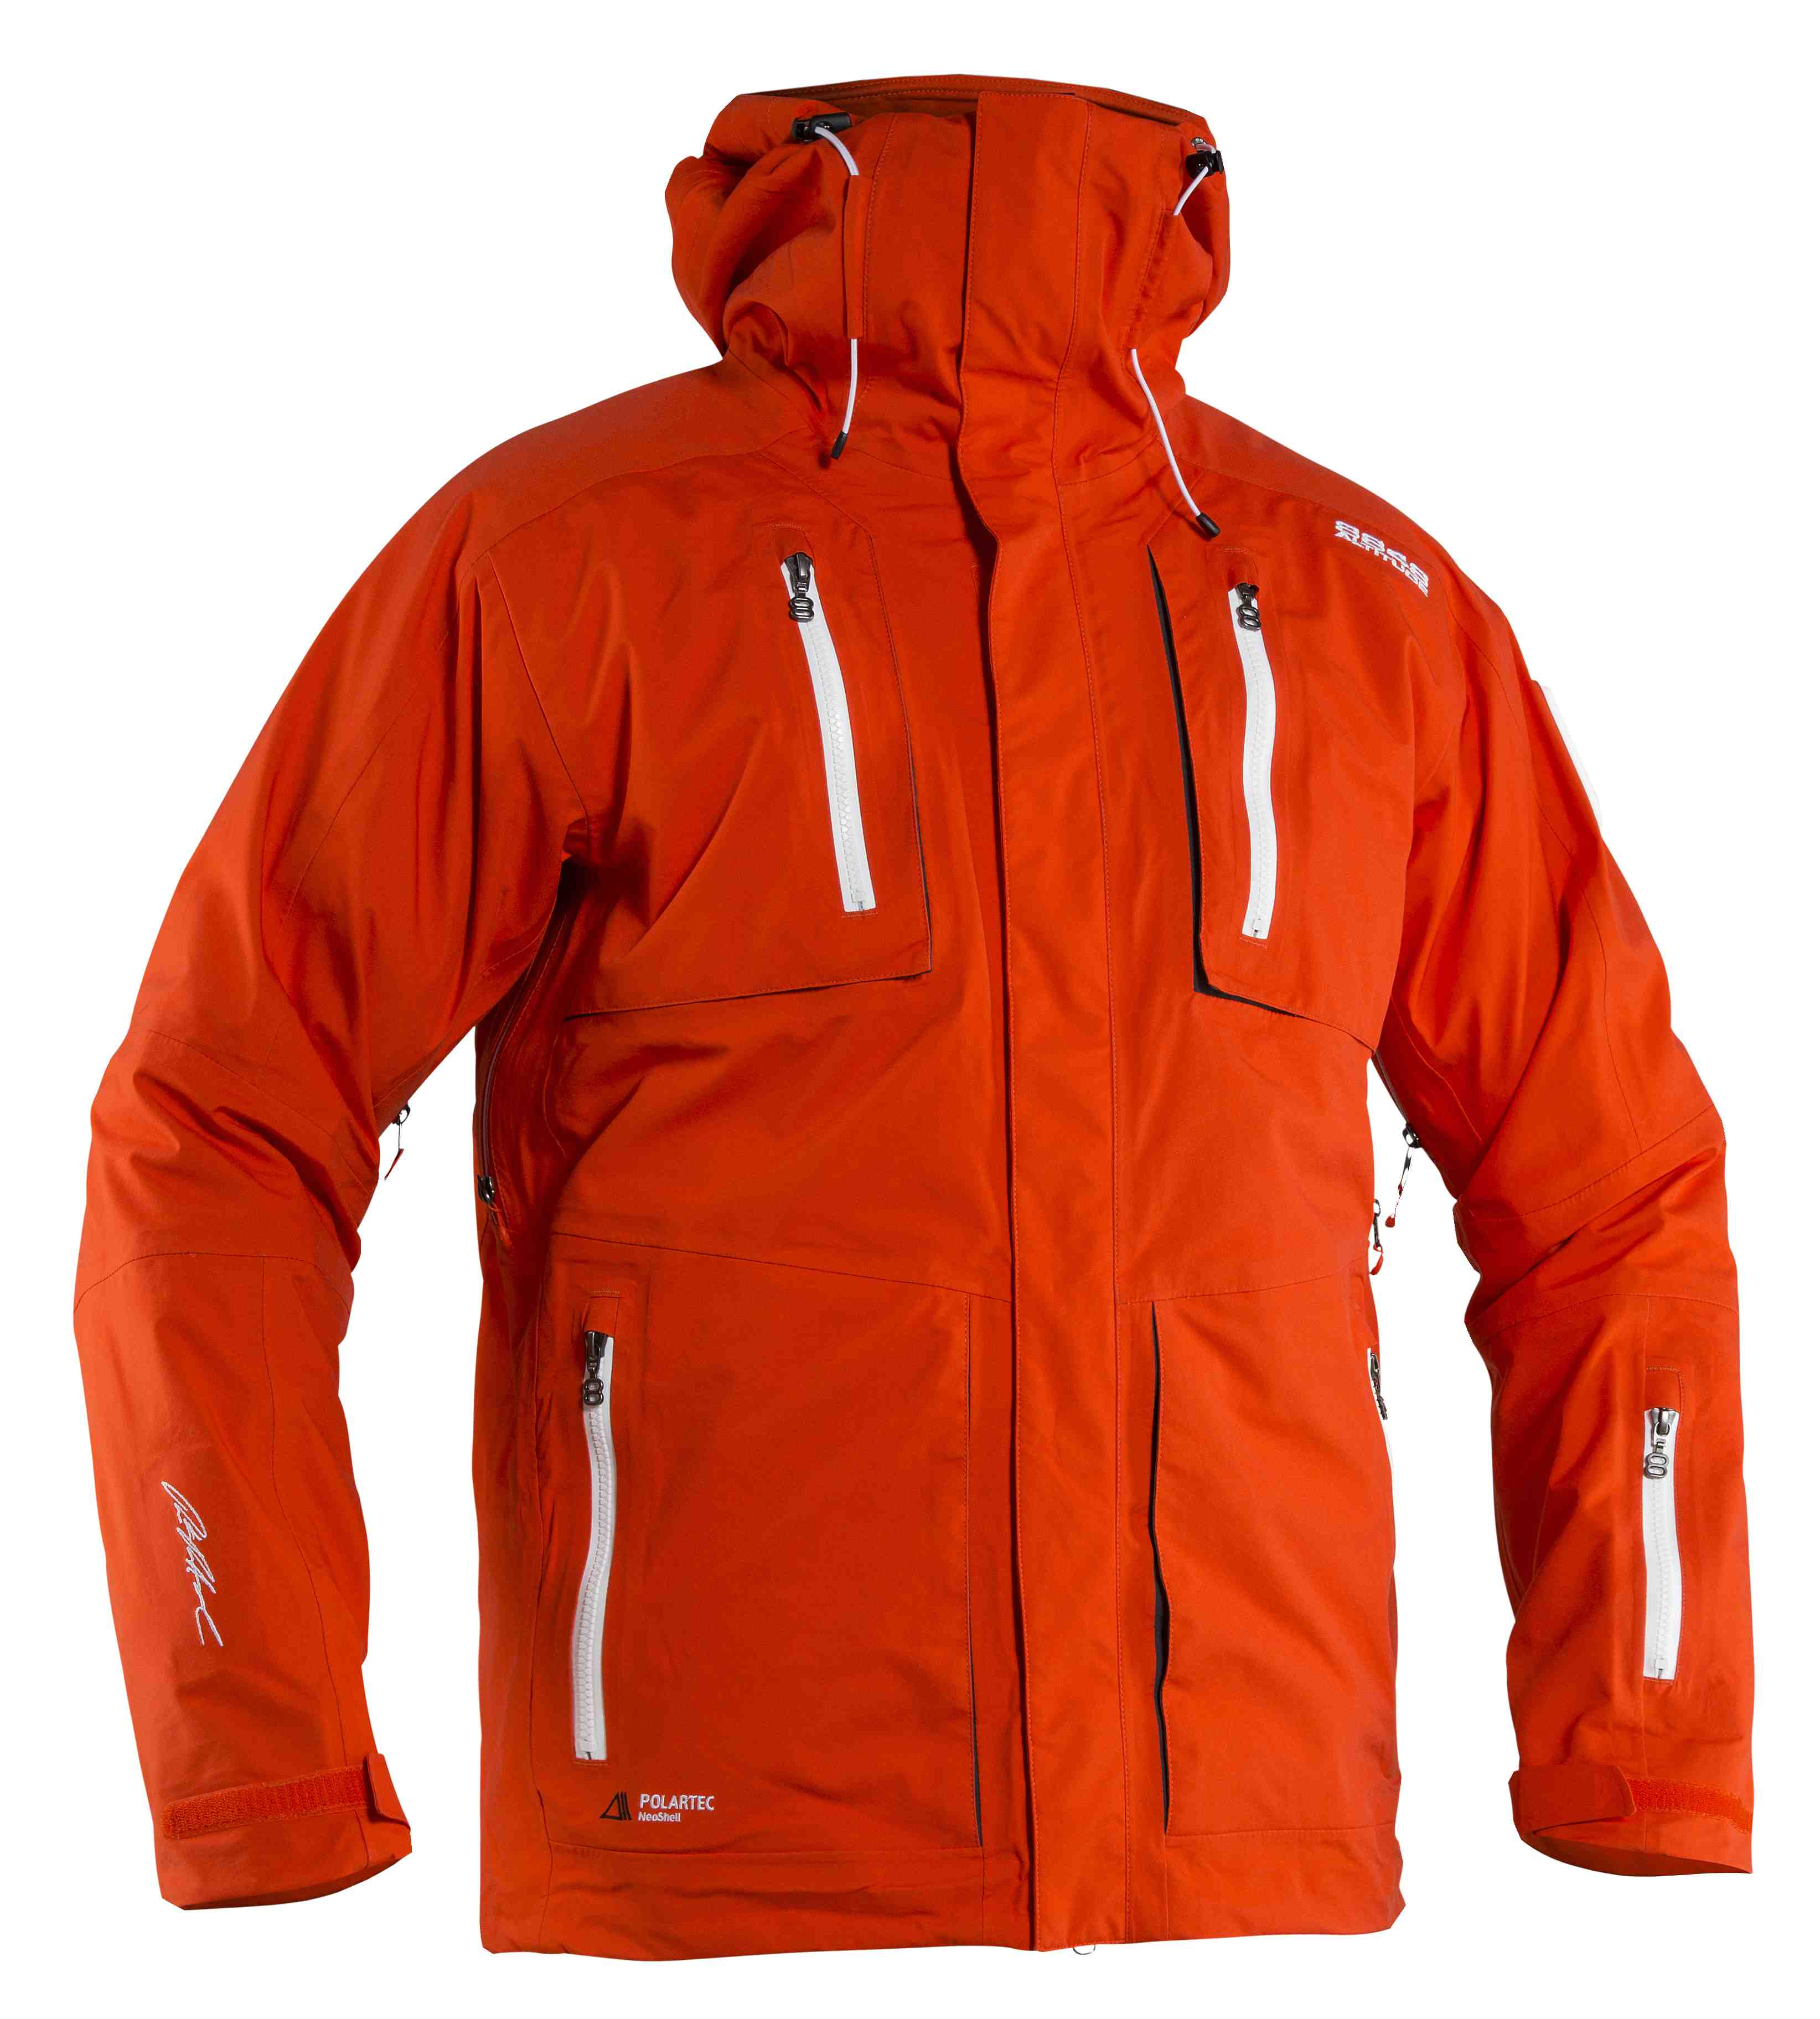 8848 Altitude Reine Barkered signature jacket with Polartecr NeoShellr